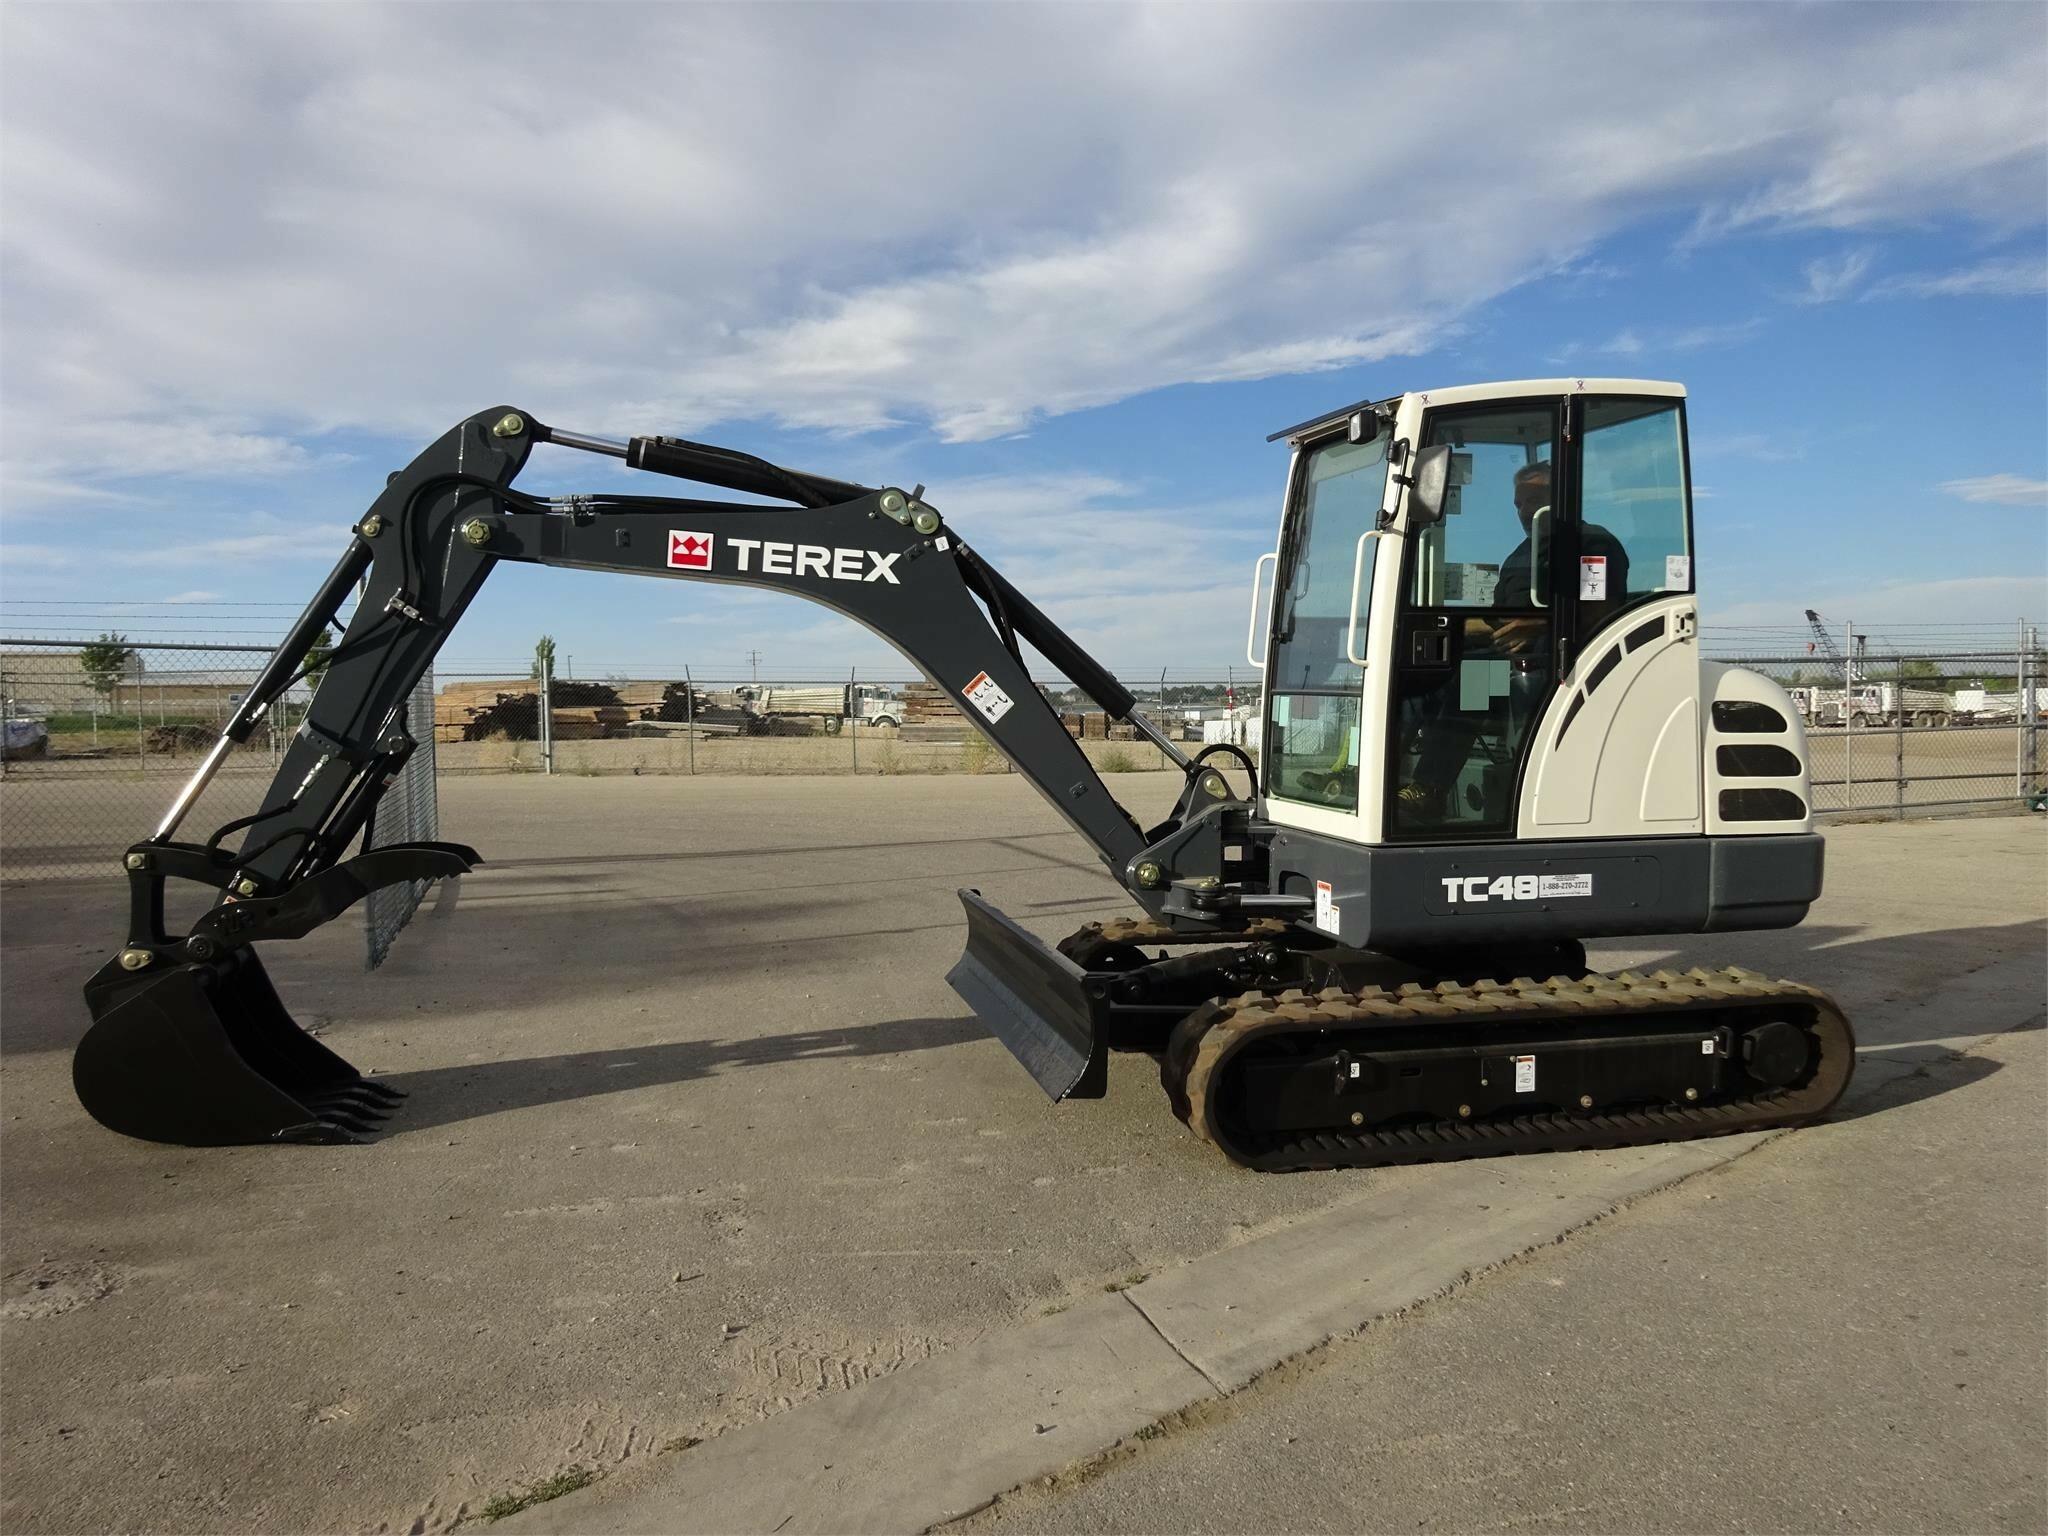 2015 Terex TC48 Excavators and Mini Excavator